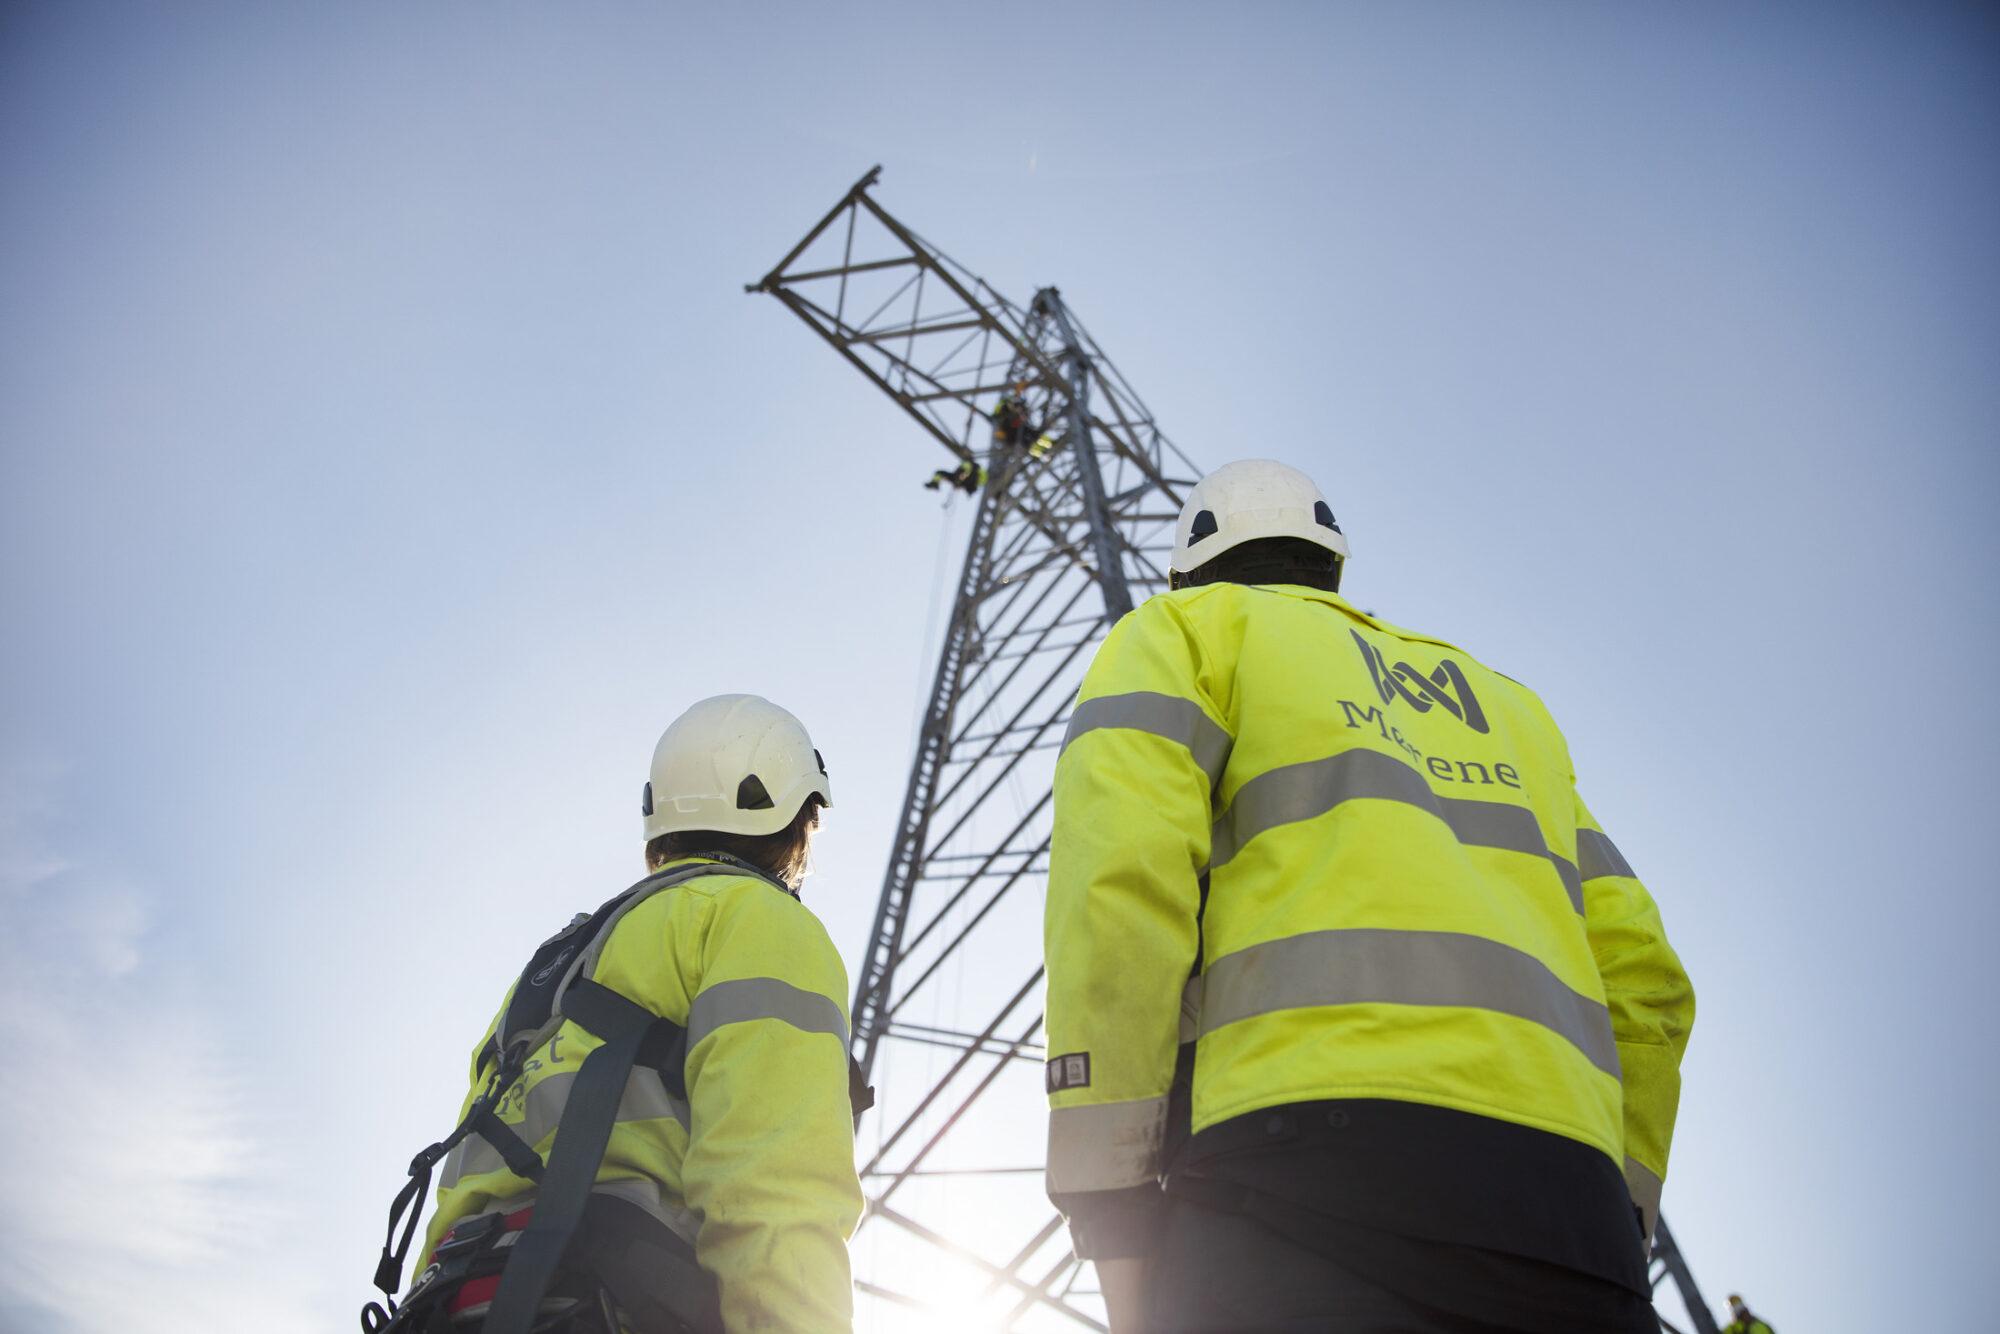 Norska energibolaget Mørenett väljer Hypergene